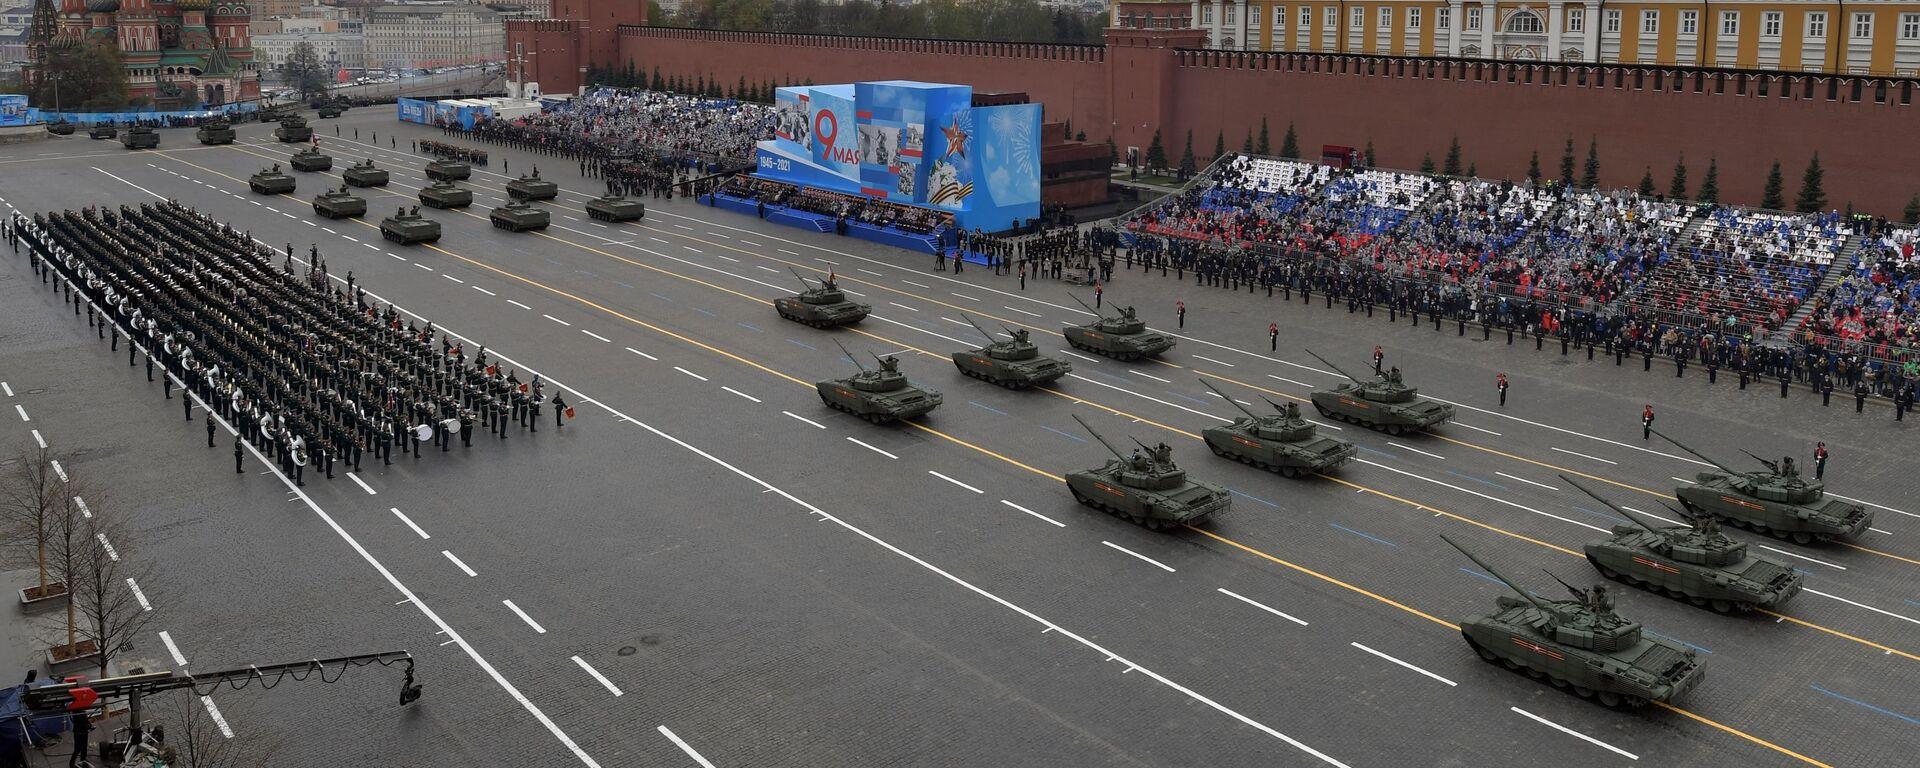 Tenkovi T-72B3M na vojnom delu Parade pobede povodom obeležavanja 76. godišnjice pobede u Drugom svetskom ratu - Sputnik Srbija, 1920, 16.05.2021